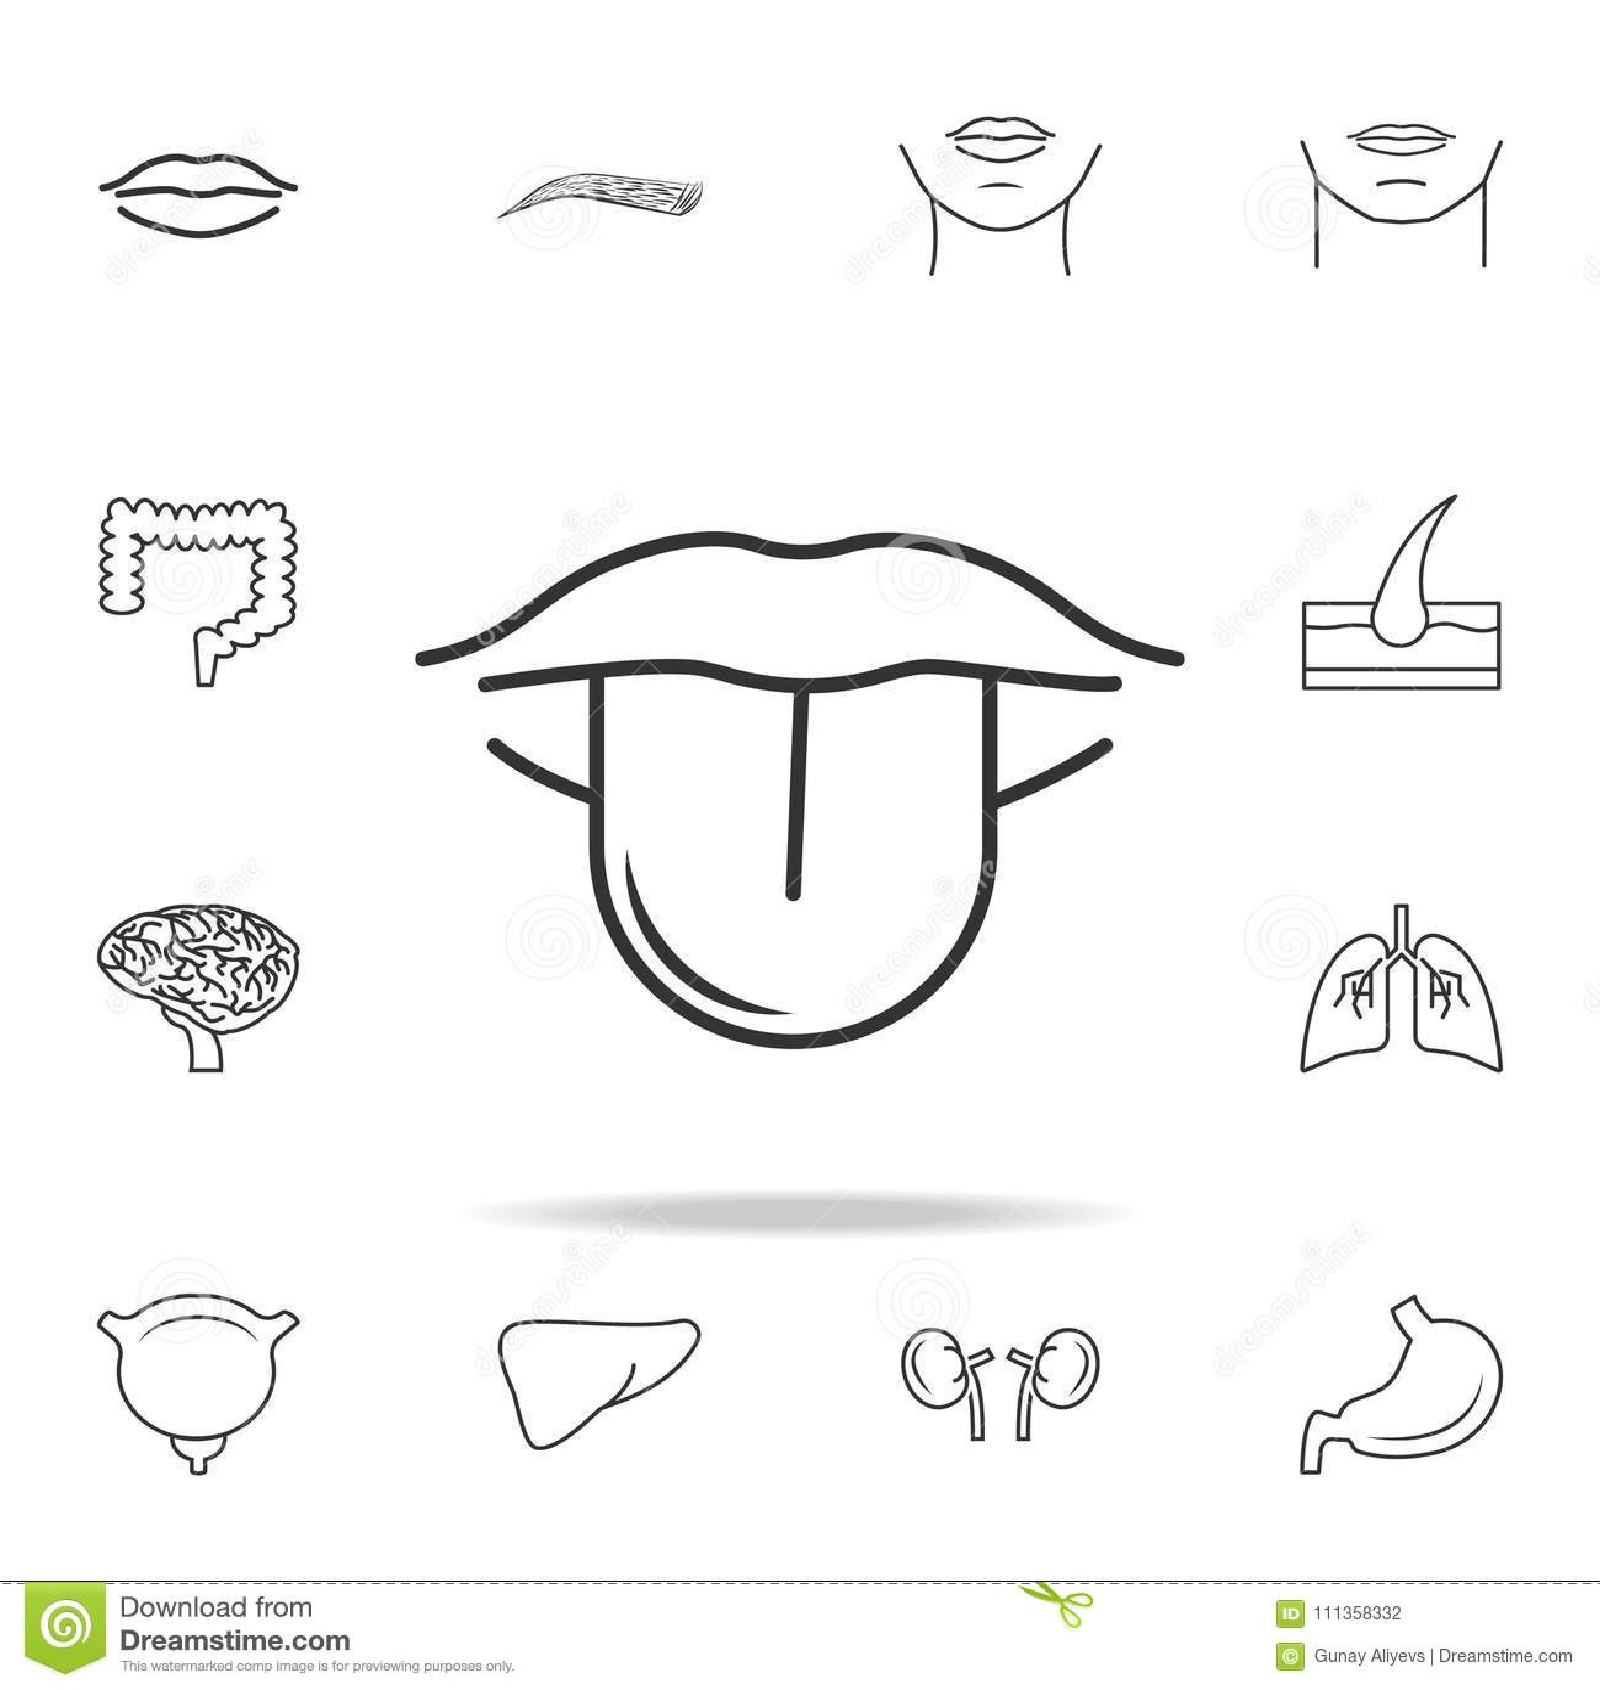 Human Anatomy For Kids Vector Illustration